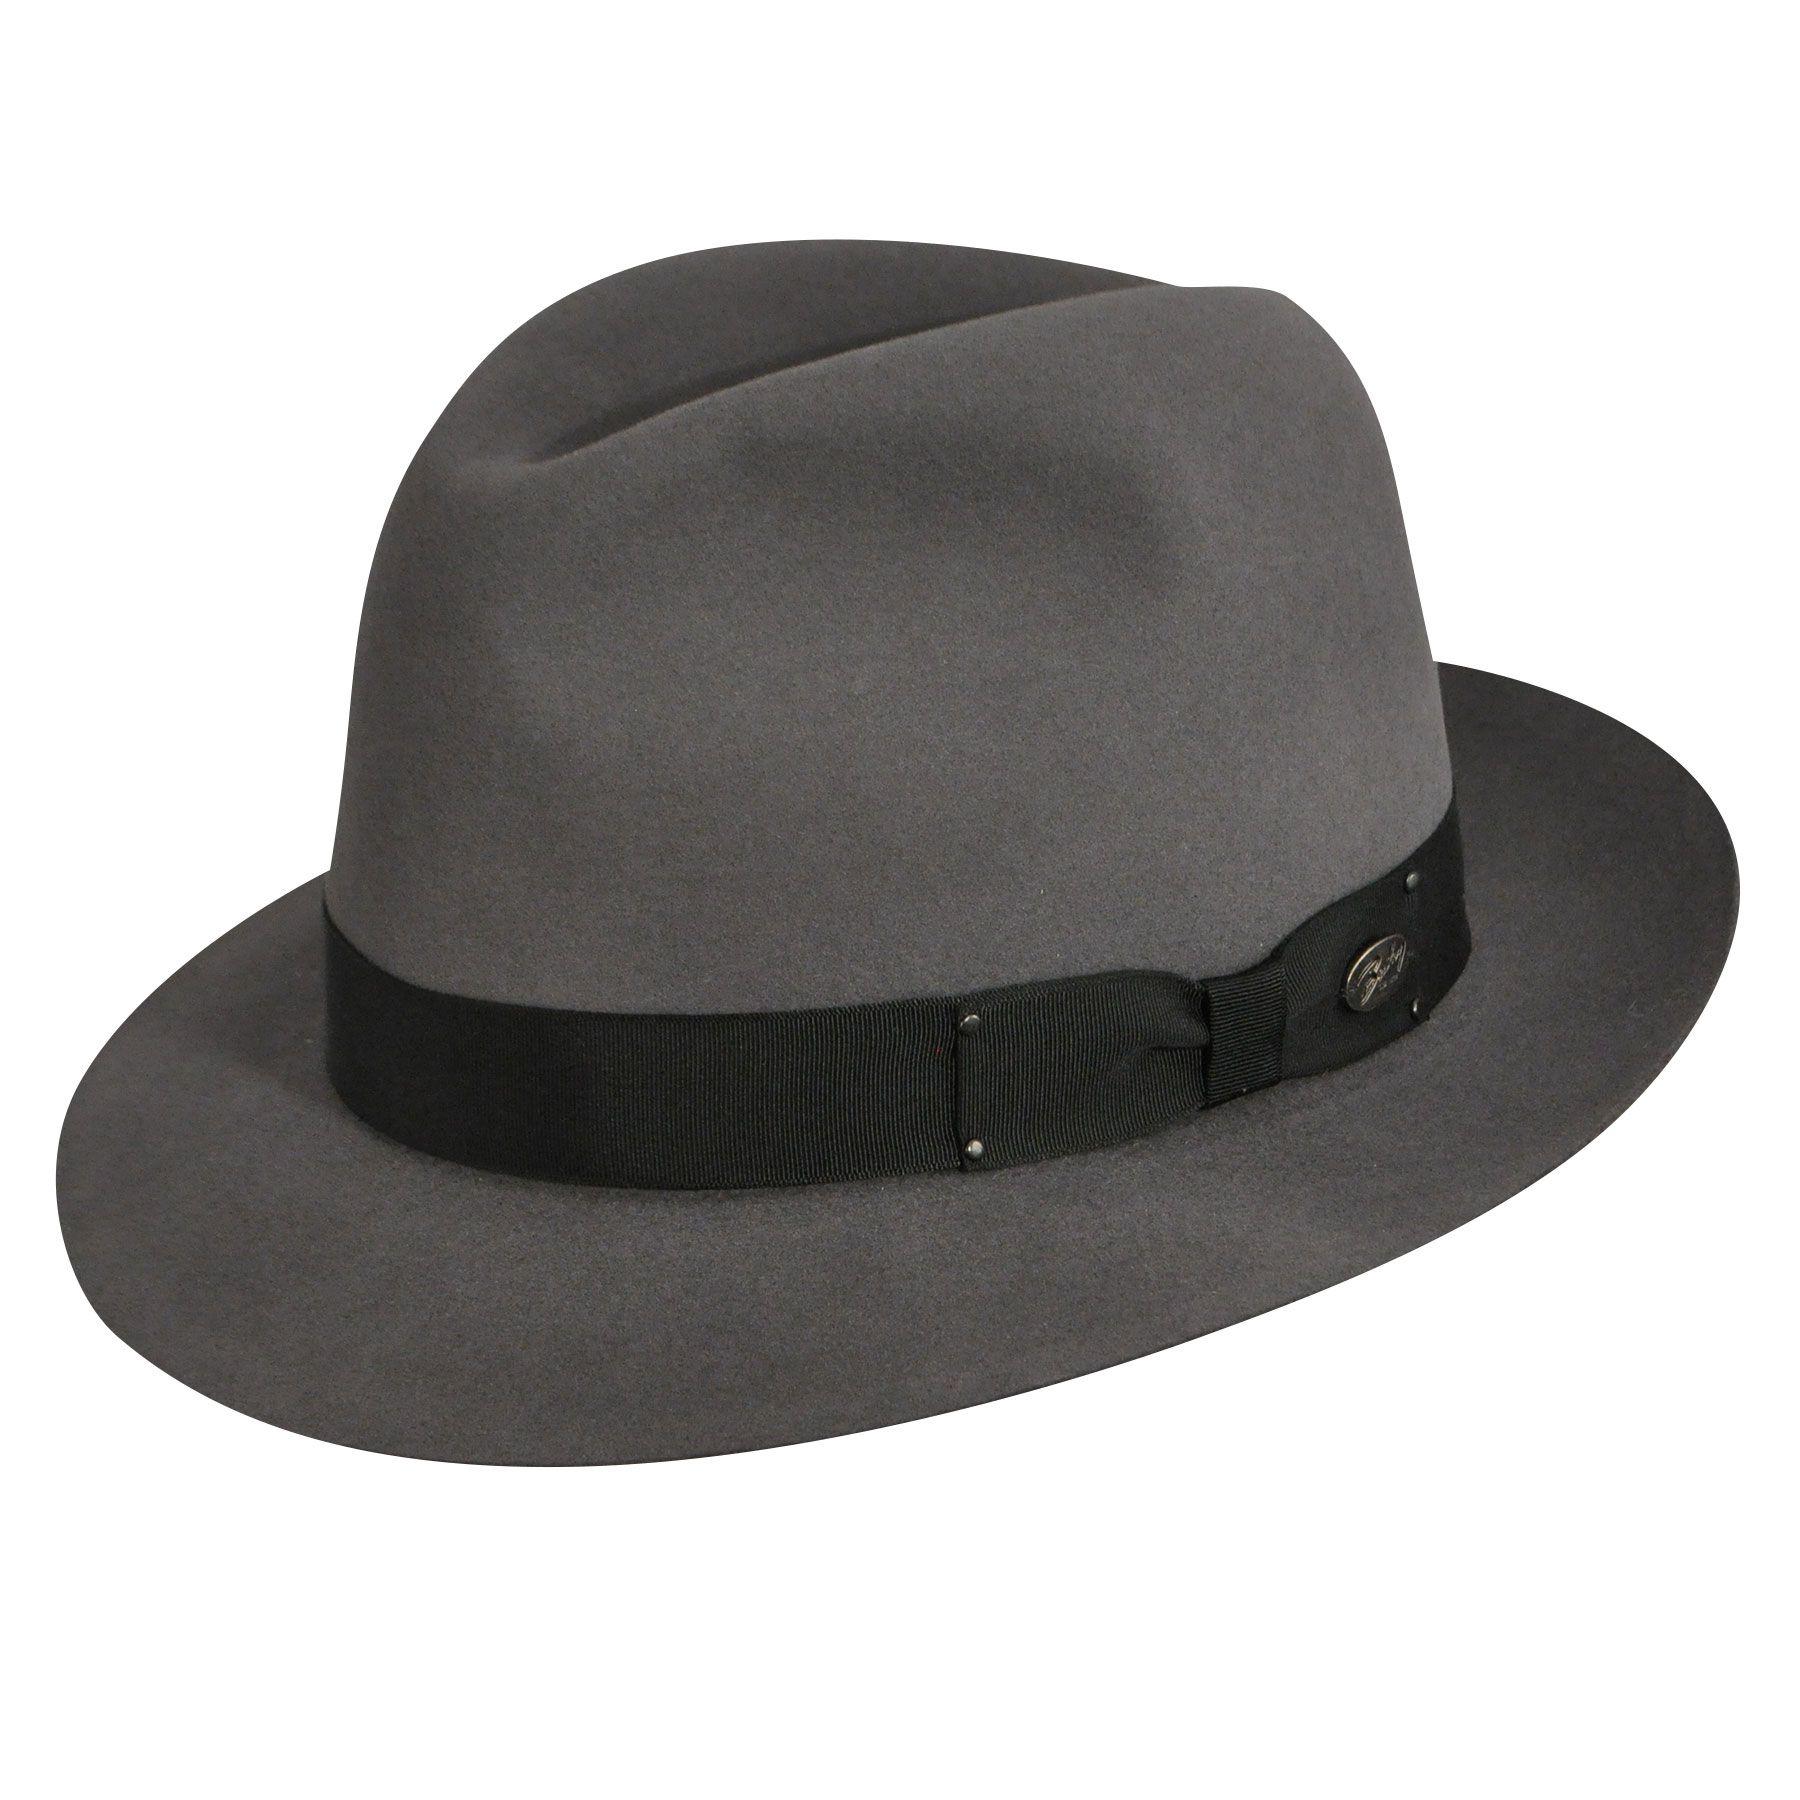 1960 S Style Mens Hats Mens Hats Fashion Hats For Men 1960 Mens Fashion